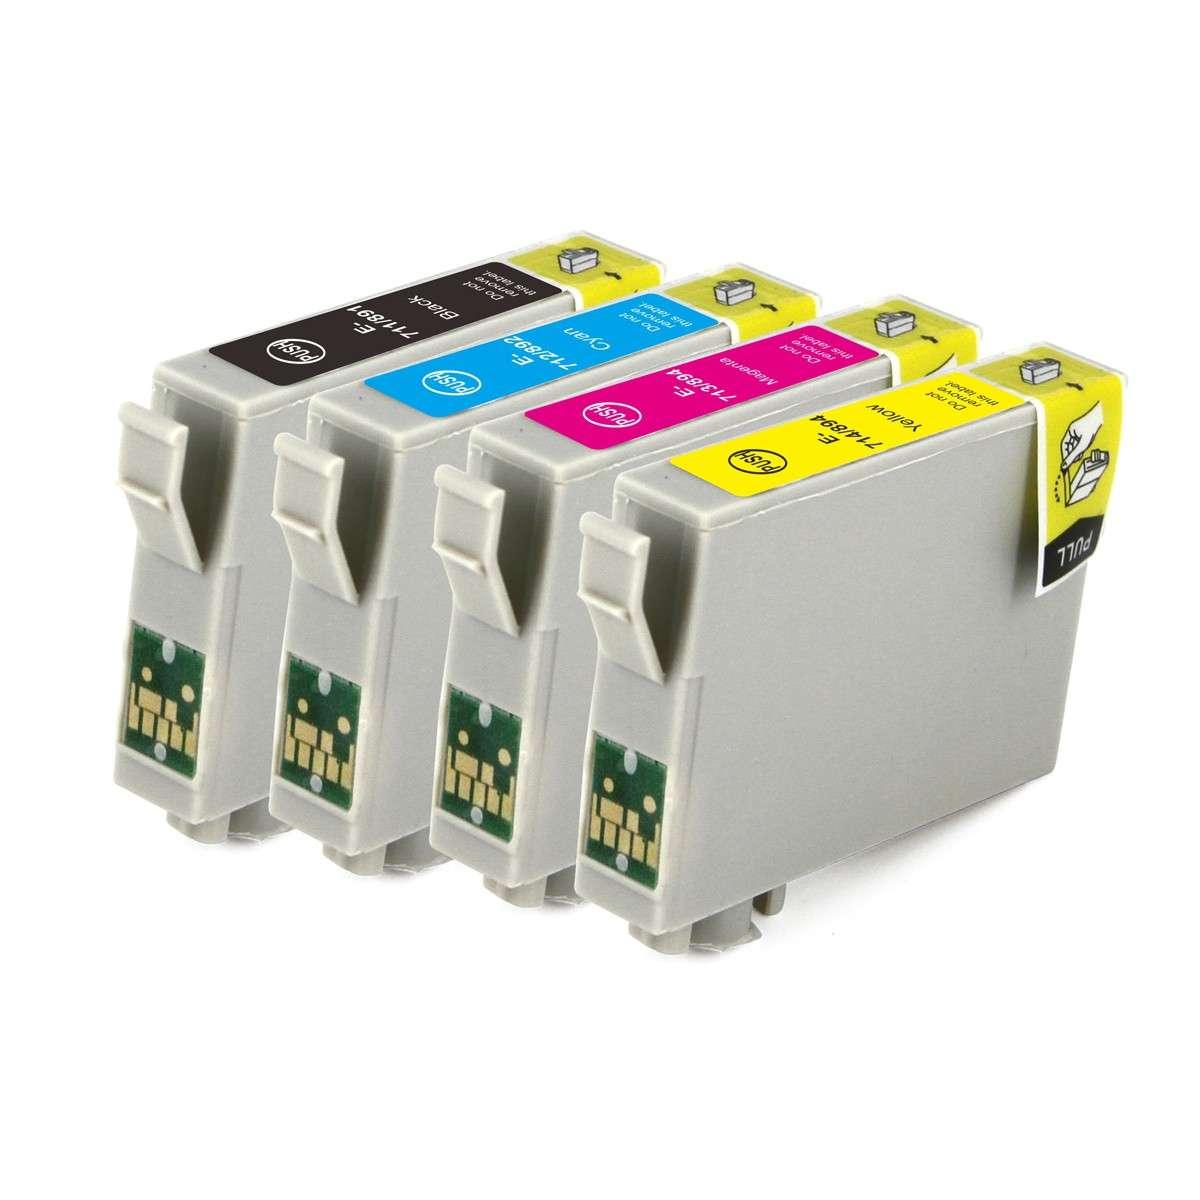 Epson Multipack Ink Cartridges (T0711/891-T0711/894)